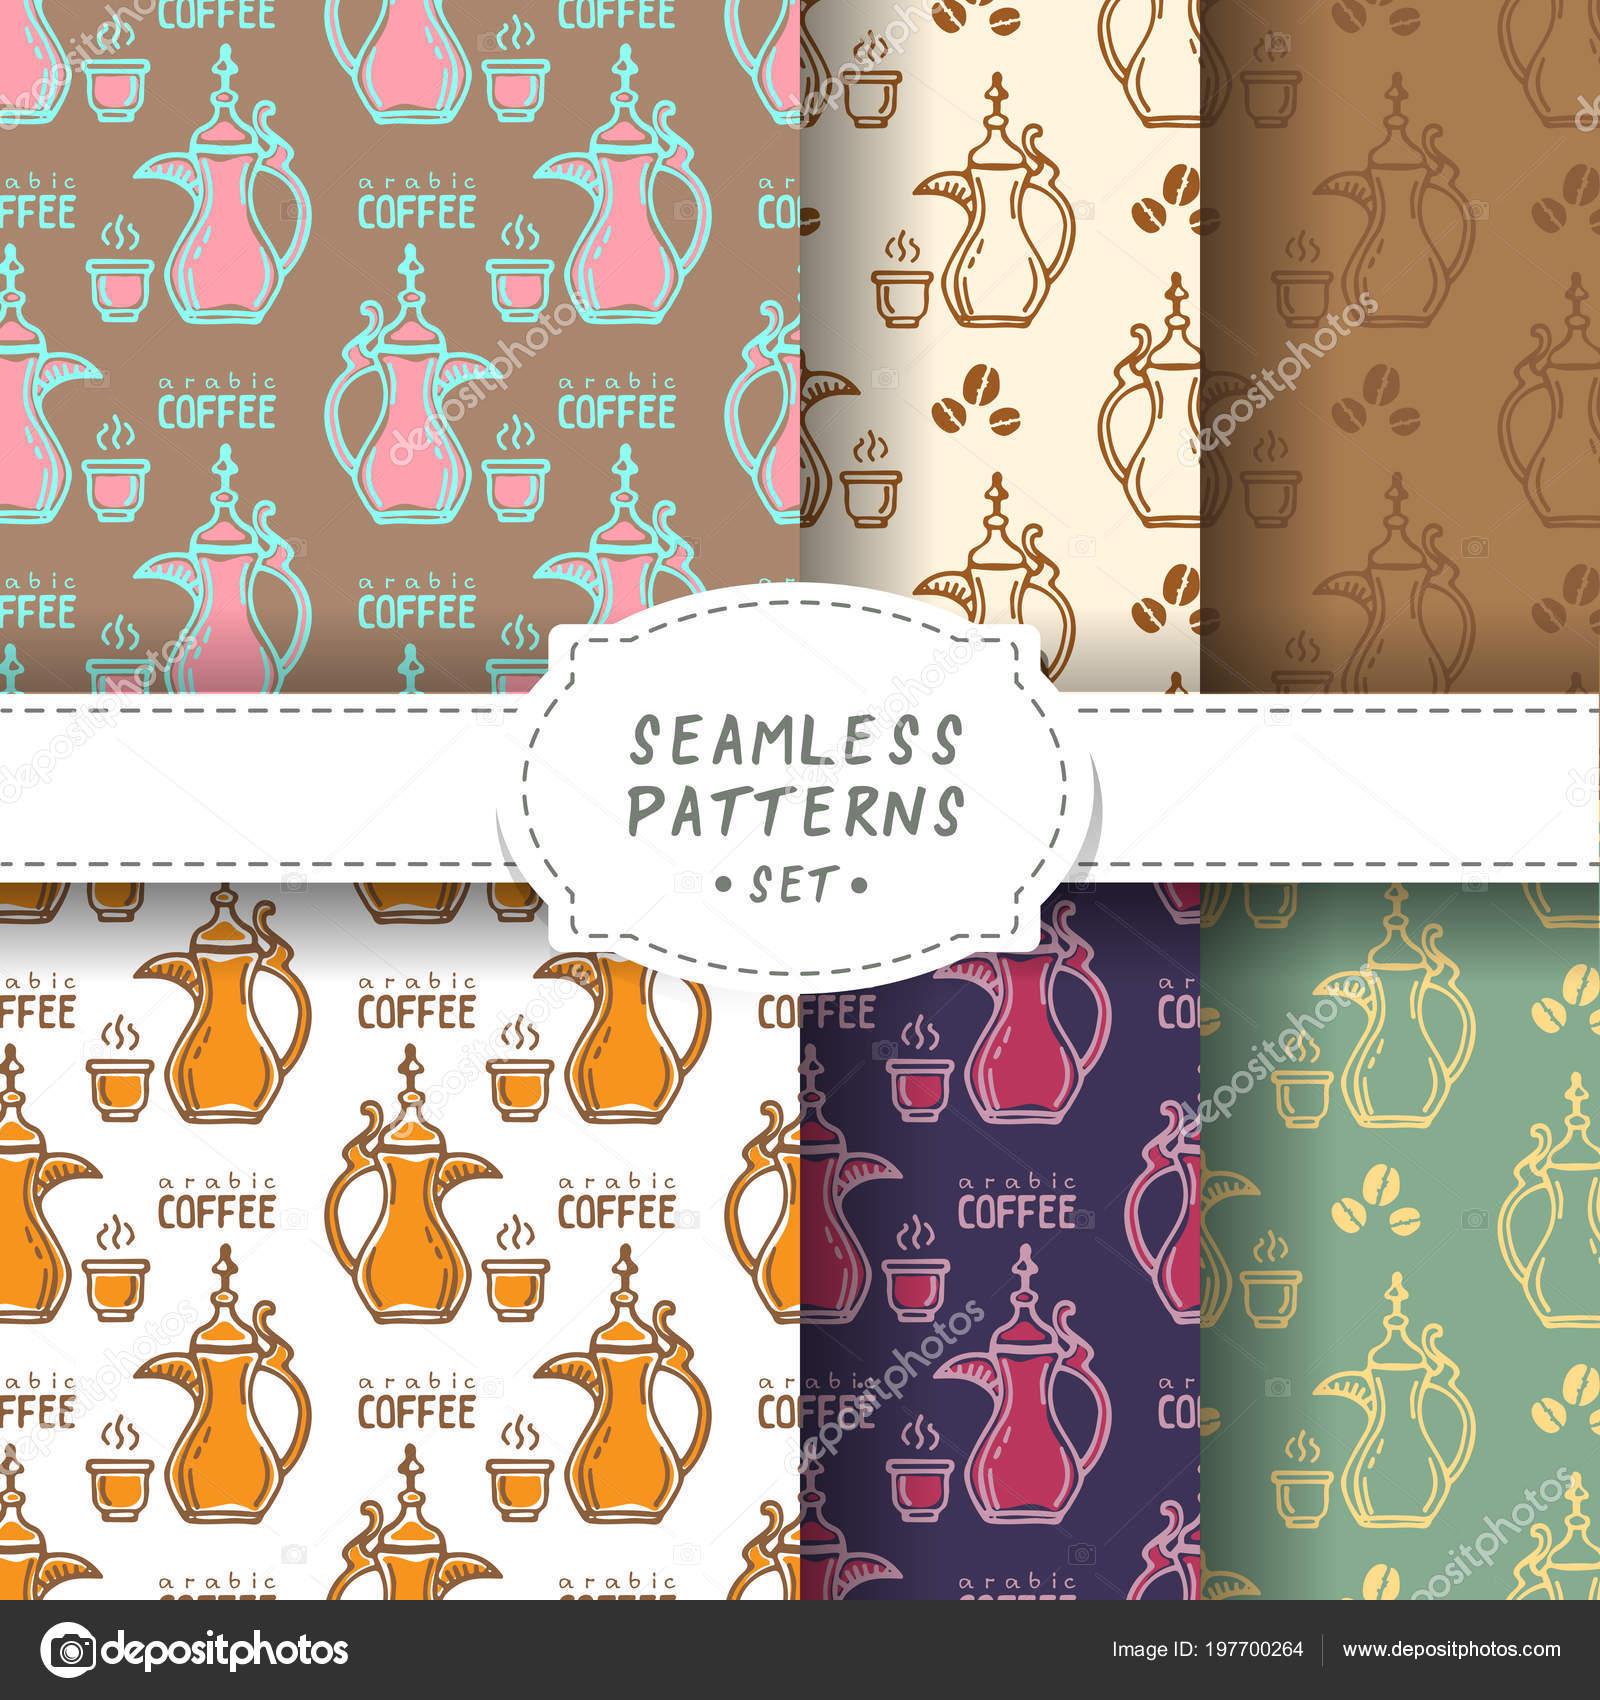 Arabic Coffee Pots Cups Seamless Patterns Set Design Element Cafe Stock Vector C Tokhiti 197700264